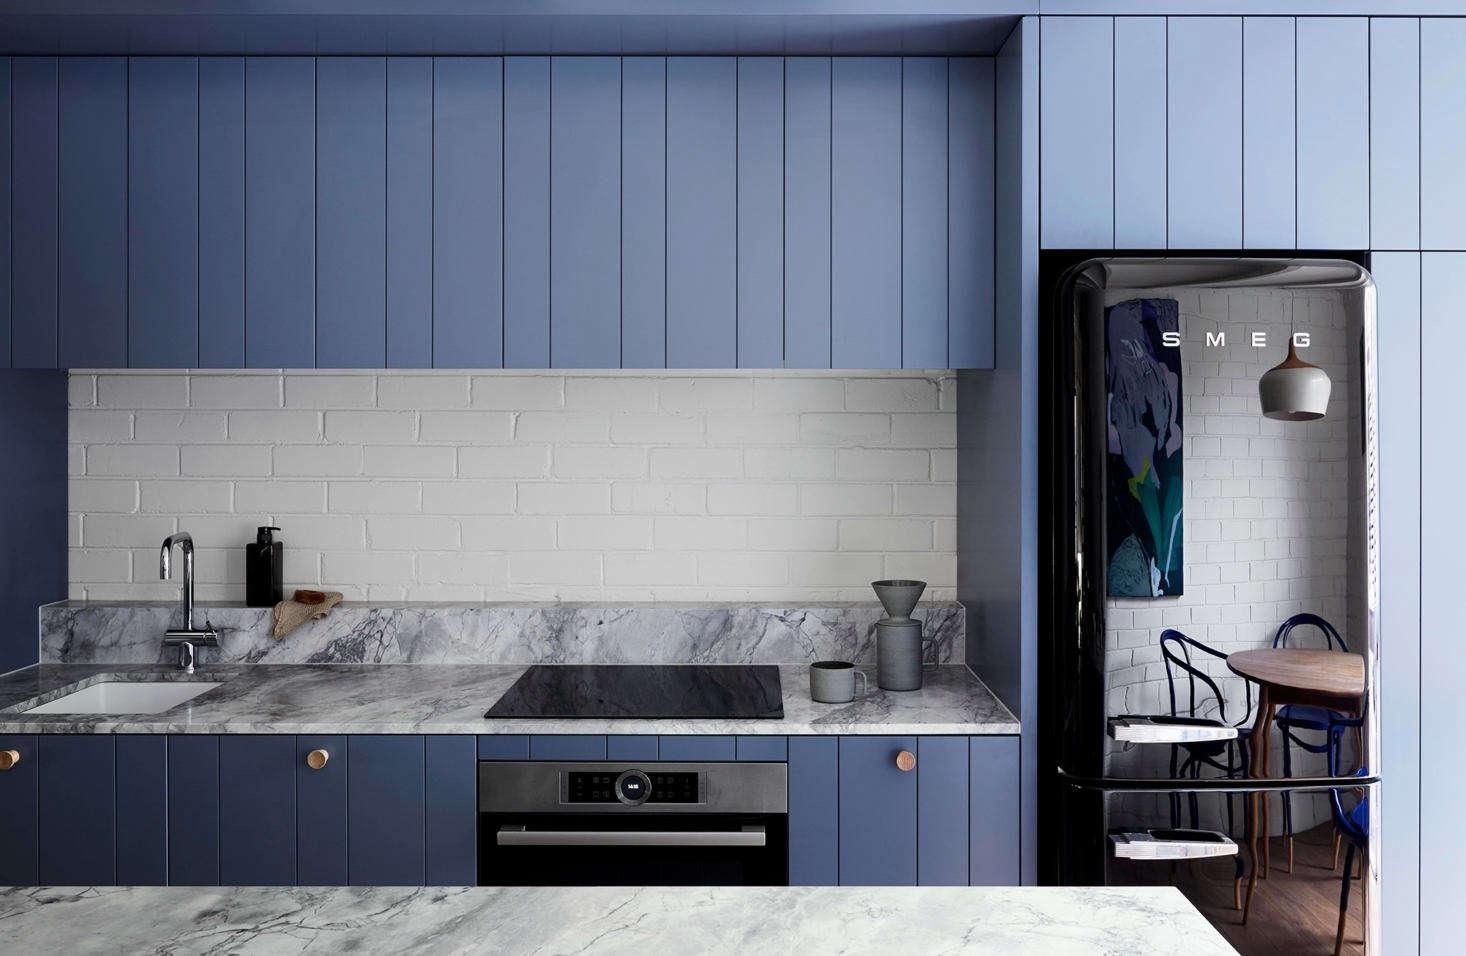 Kitchen of the Week: A Seventies-Era Overhaul in Australia